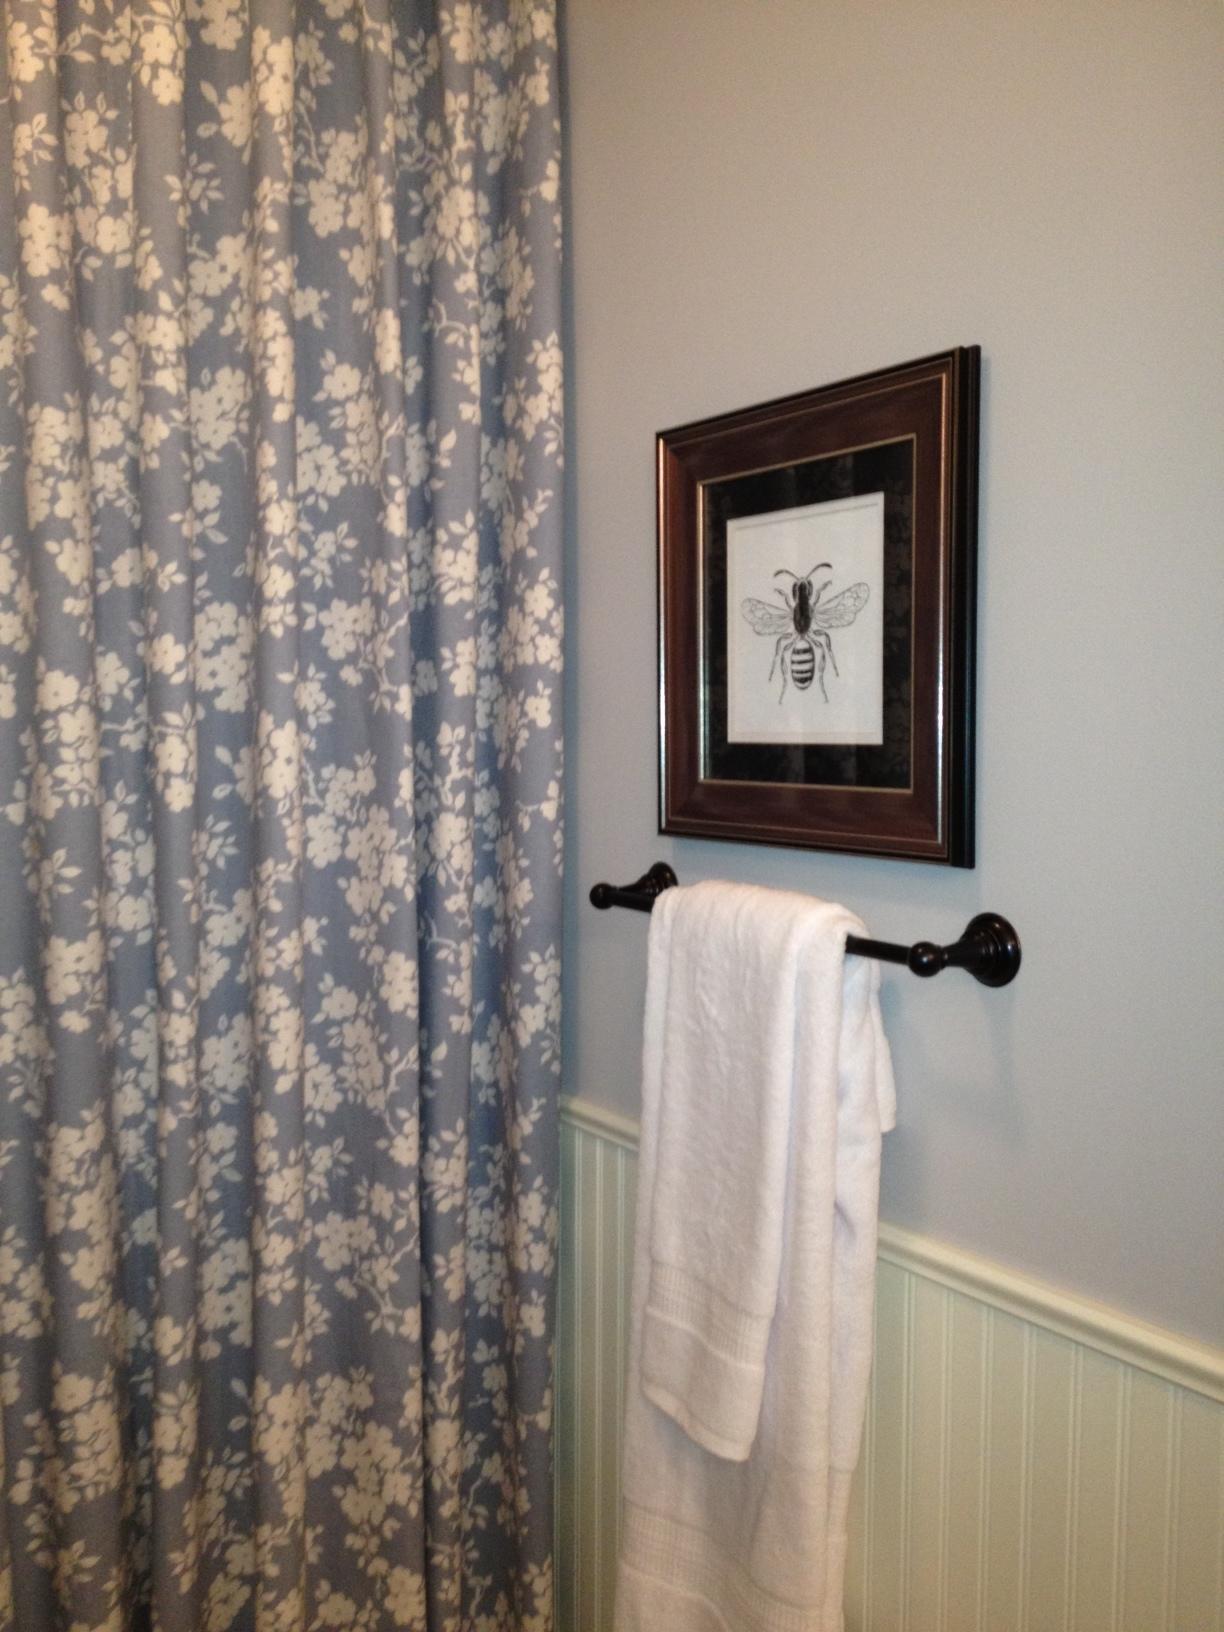 spare.bath.shower.curtain.providence.design.jpg